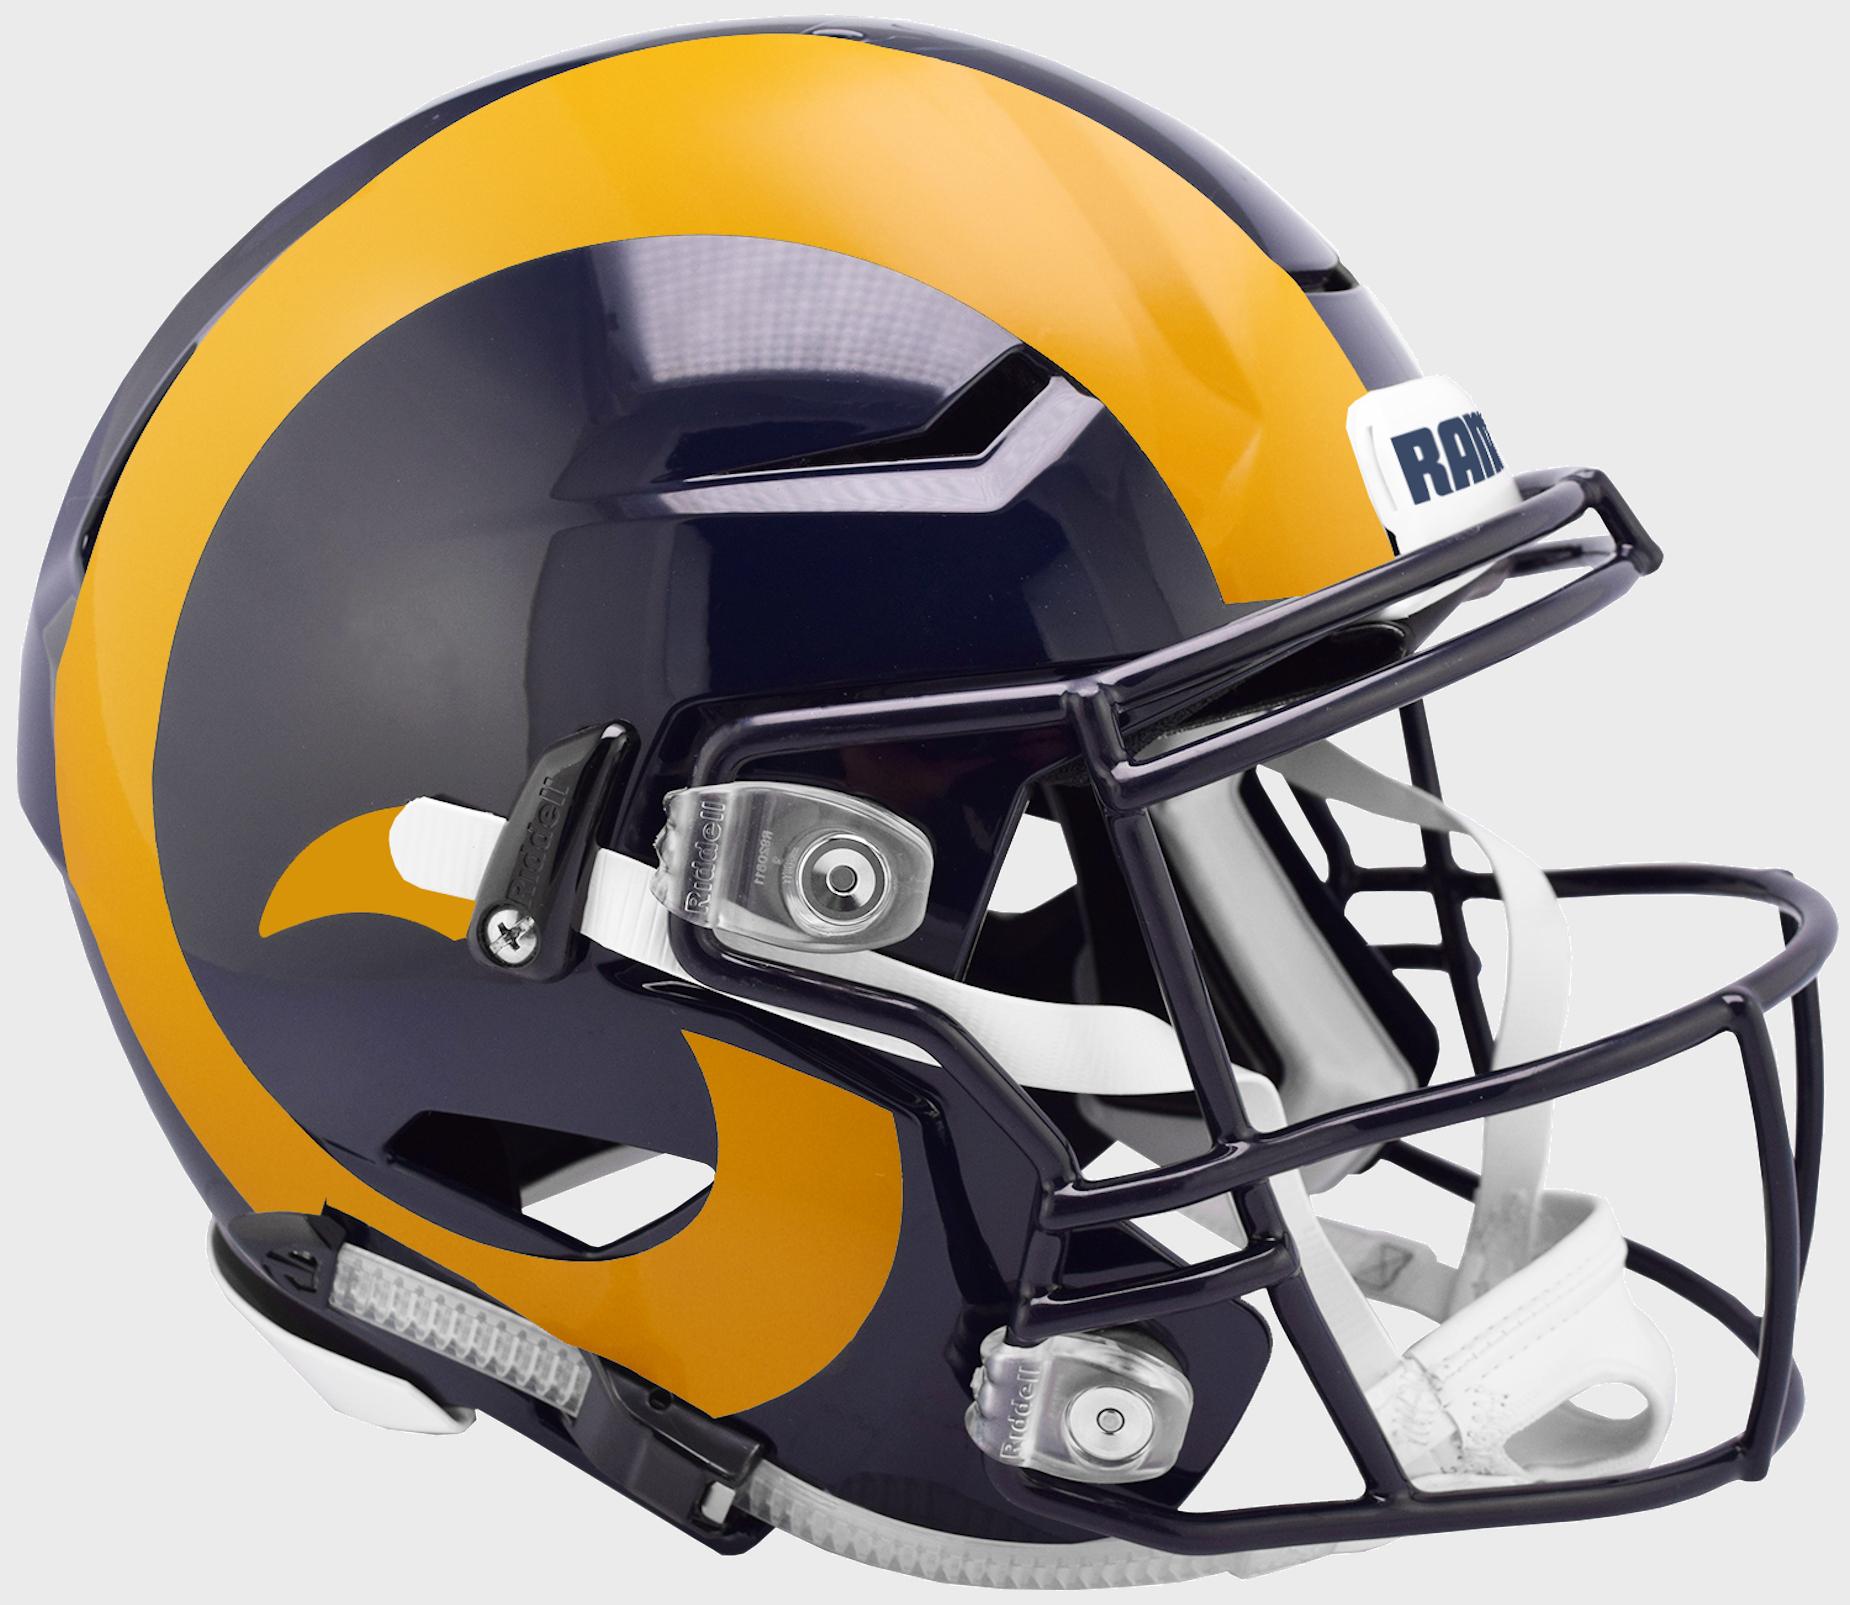 Los Angeles Rams SpeedFlex Football Helmet